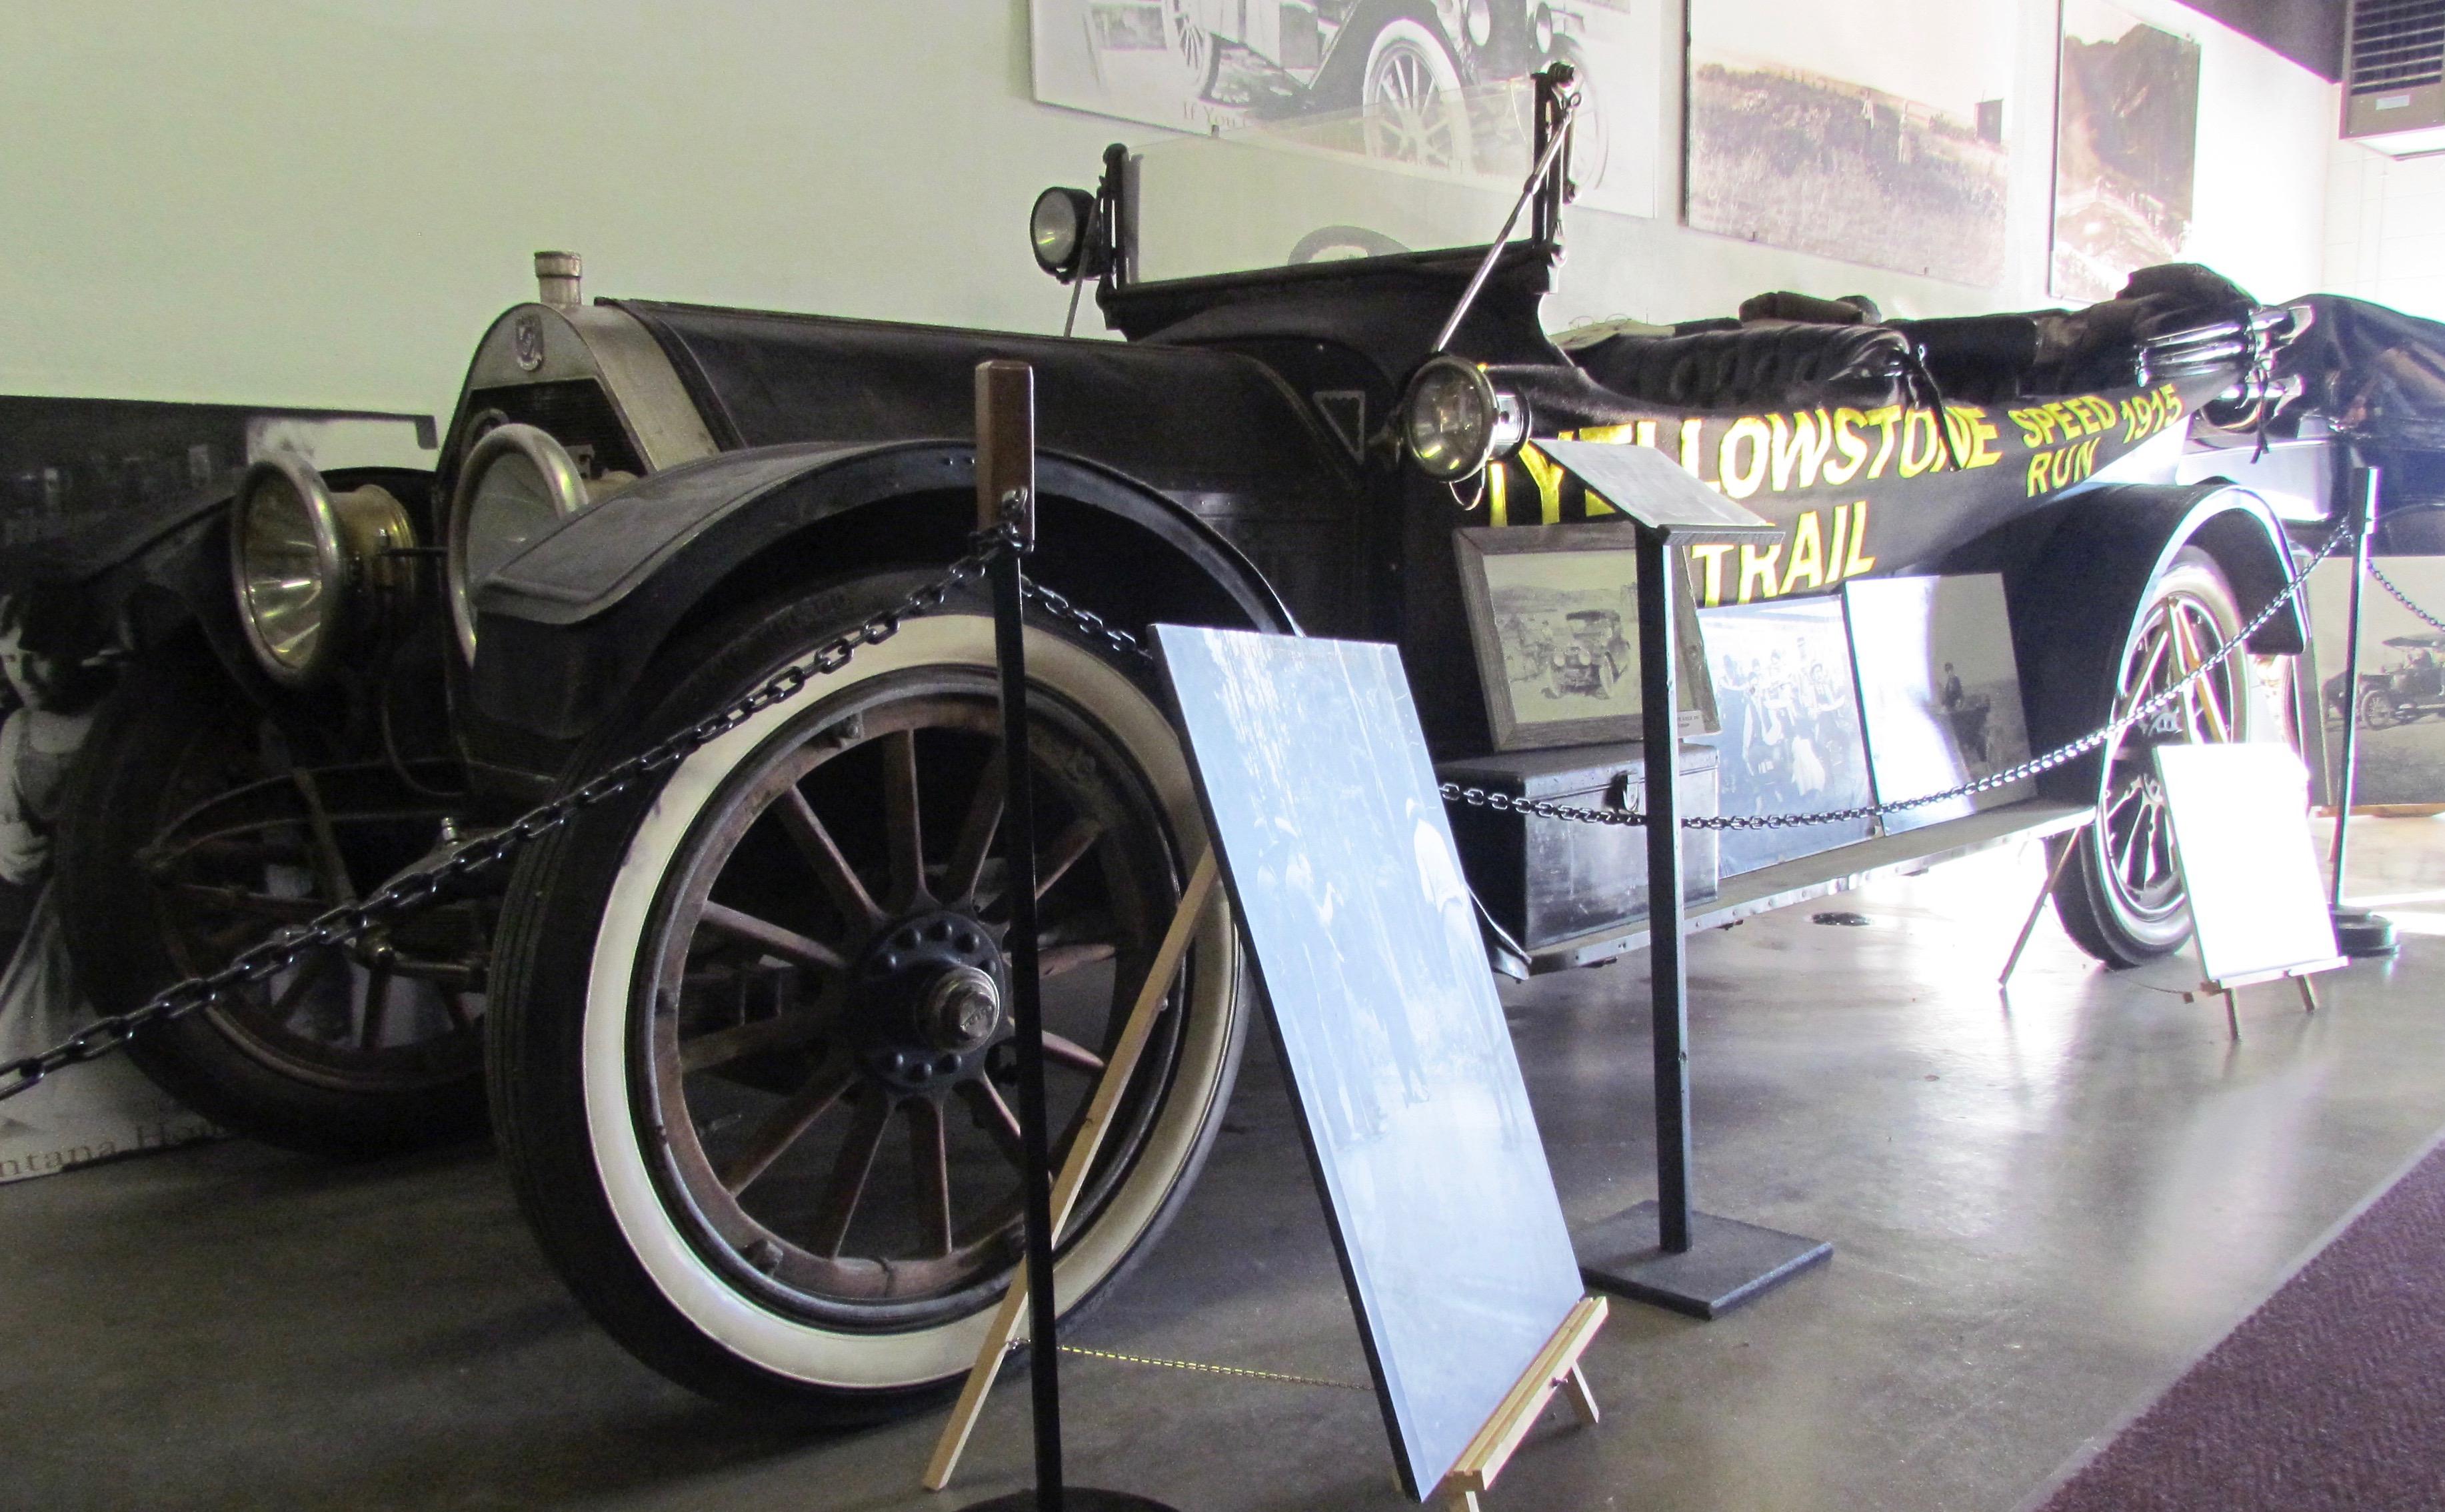 , Prison break: A tour of the Old Montana Prison includes adjacent car museum, ClassicCars.com Journal